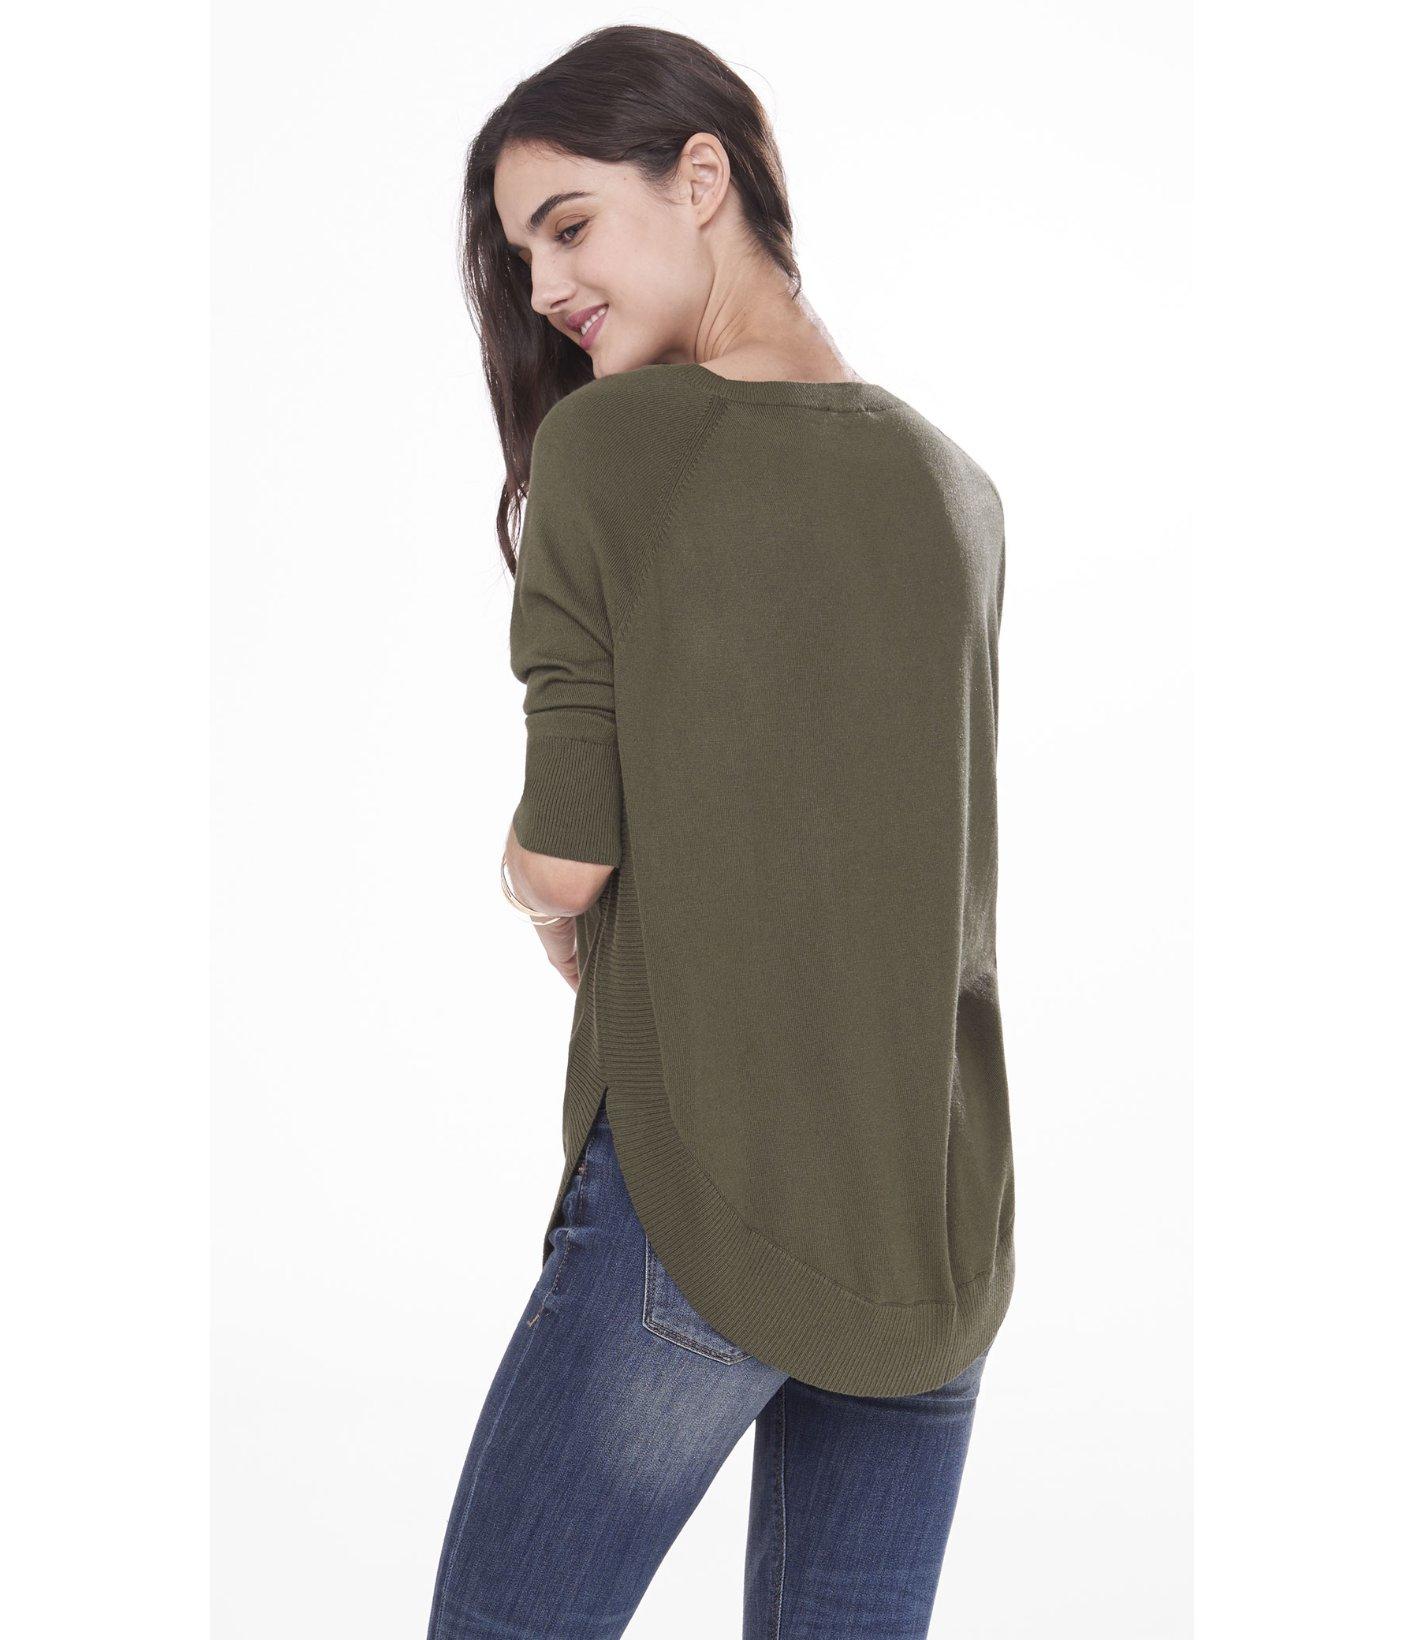 b0825c6ca Lyst - Express Extreme Circle Hem Tunic Sweater in Green